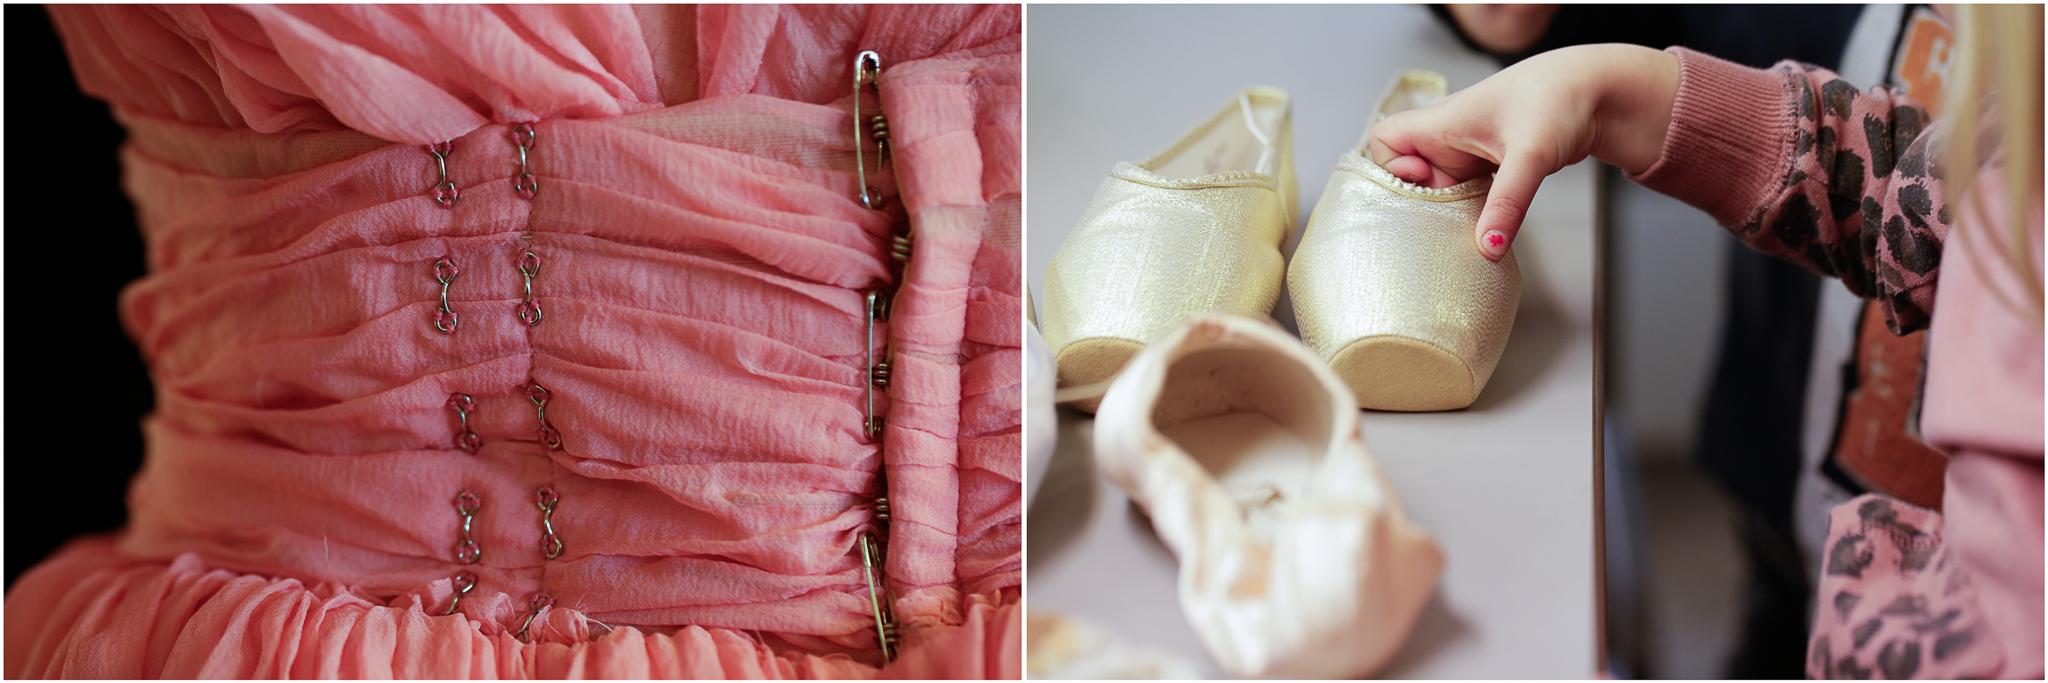 025_Fotografie Nationale Opera Ballet.jpg